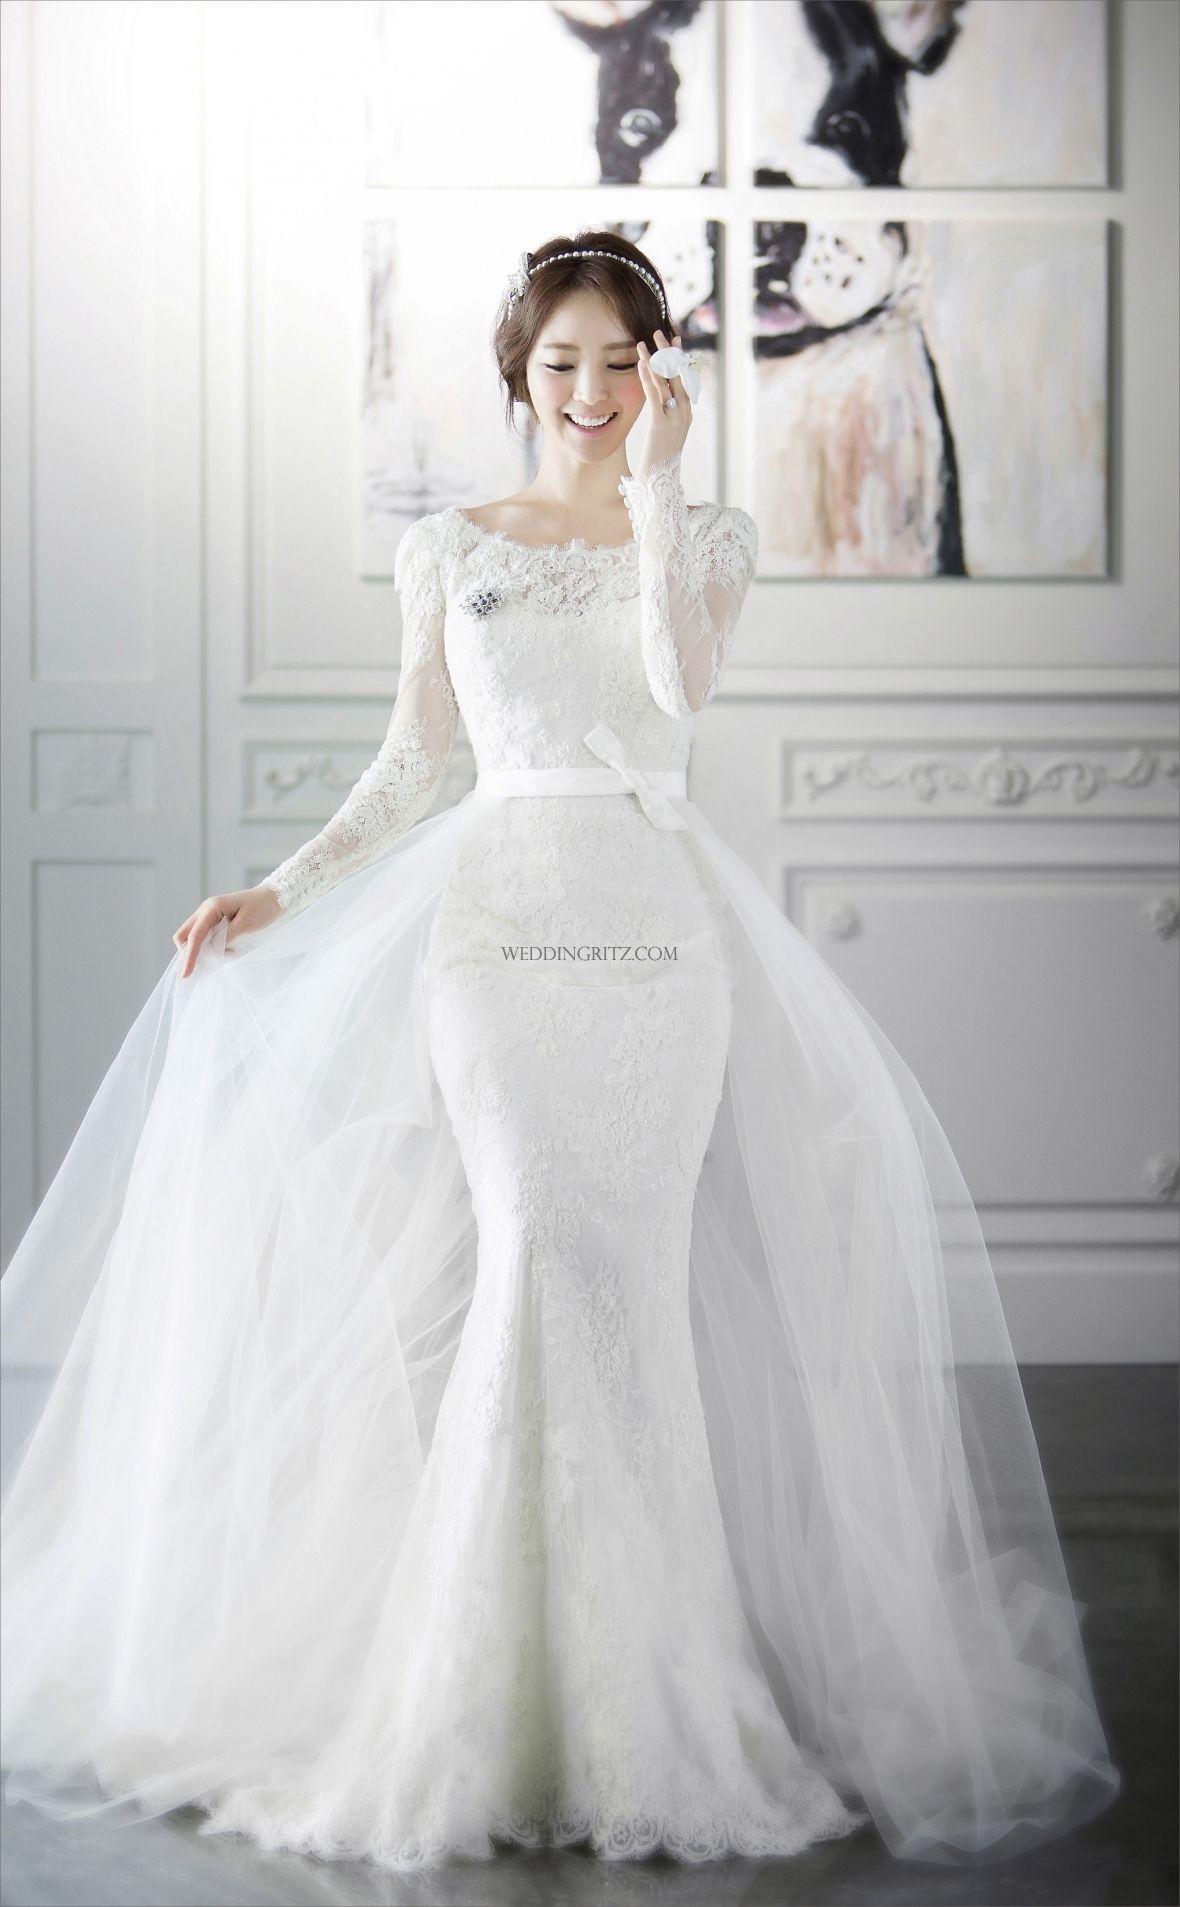 korea pre wedding studio - Glad (8).jpg  Perkawinan, Gaun